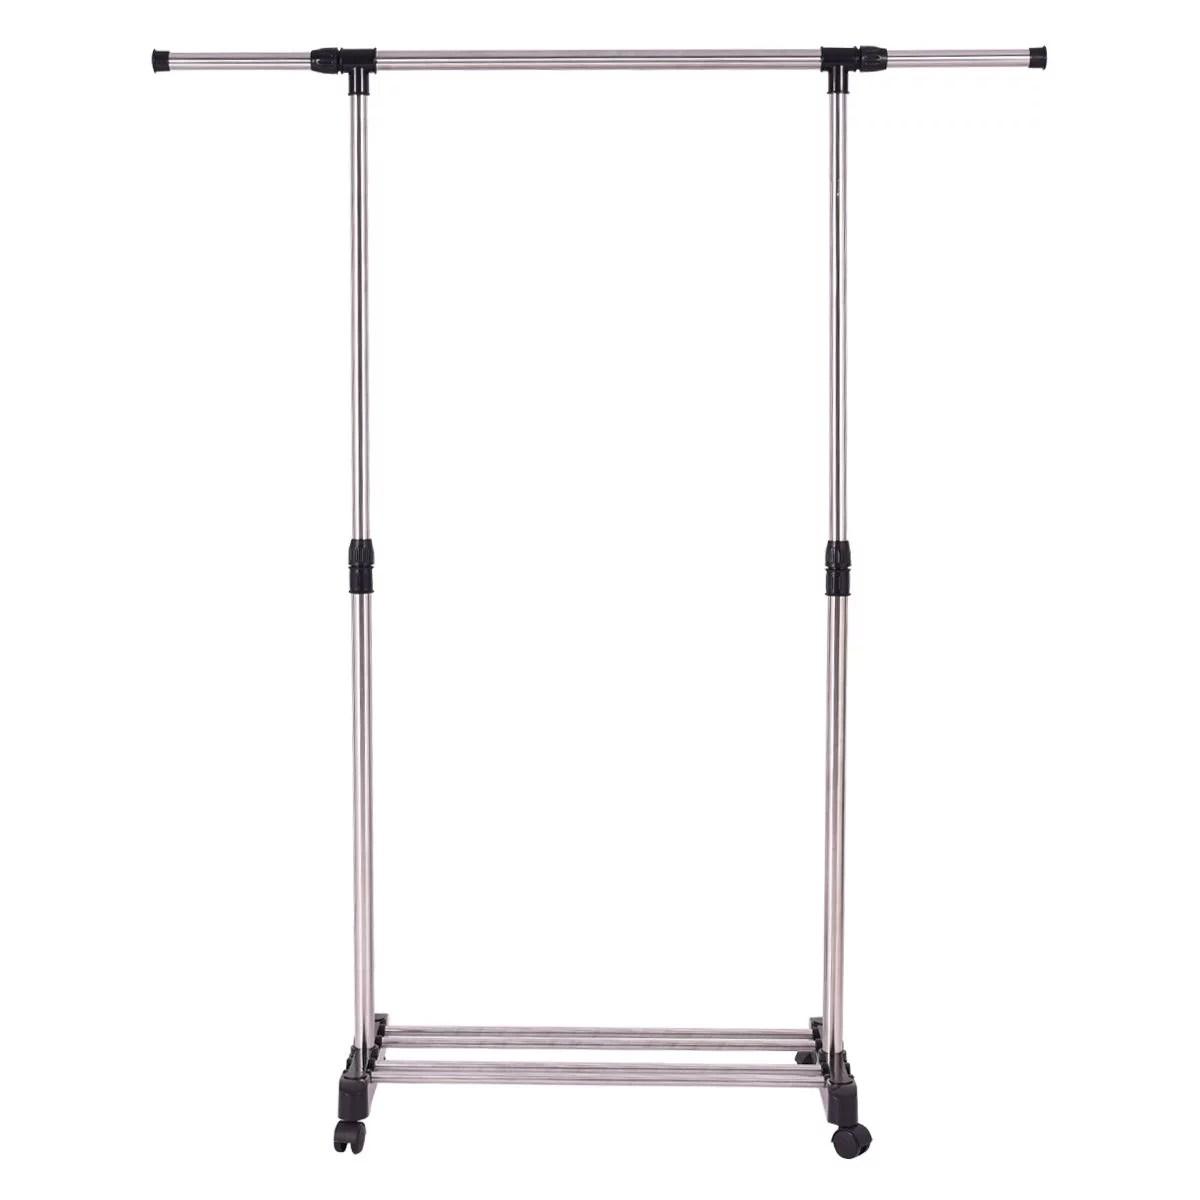 Gymax Portable Rolling Garment Rack Closet Organizer Shelf